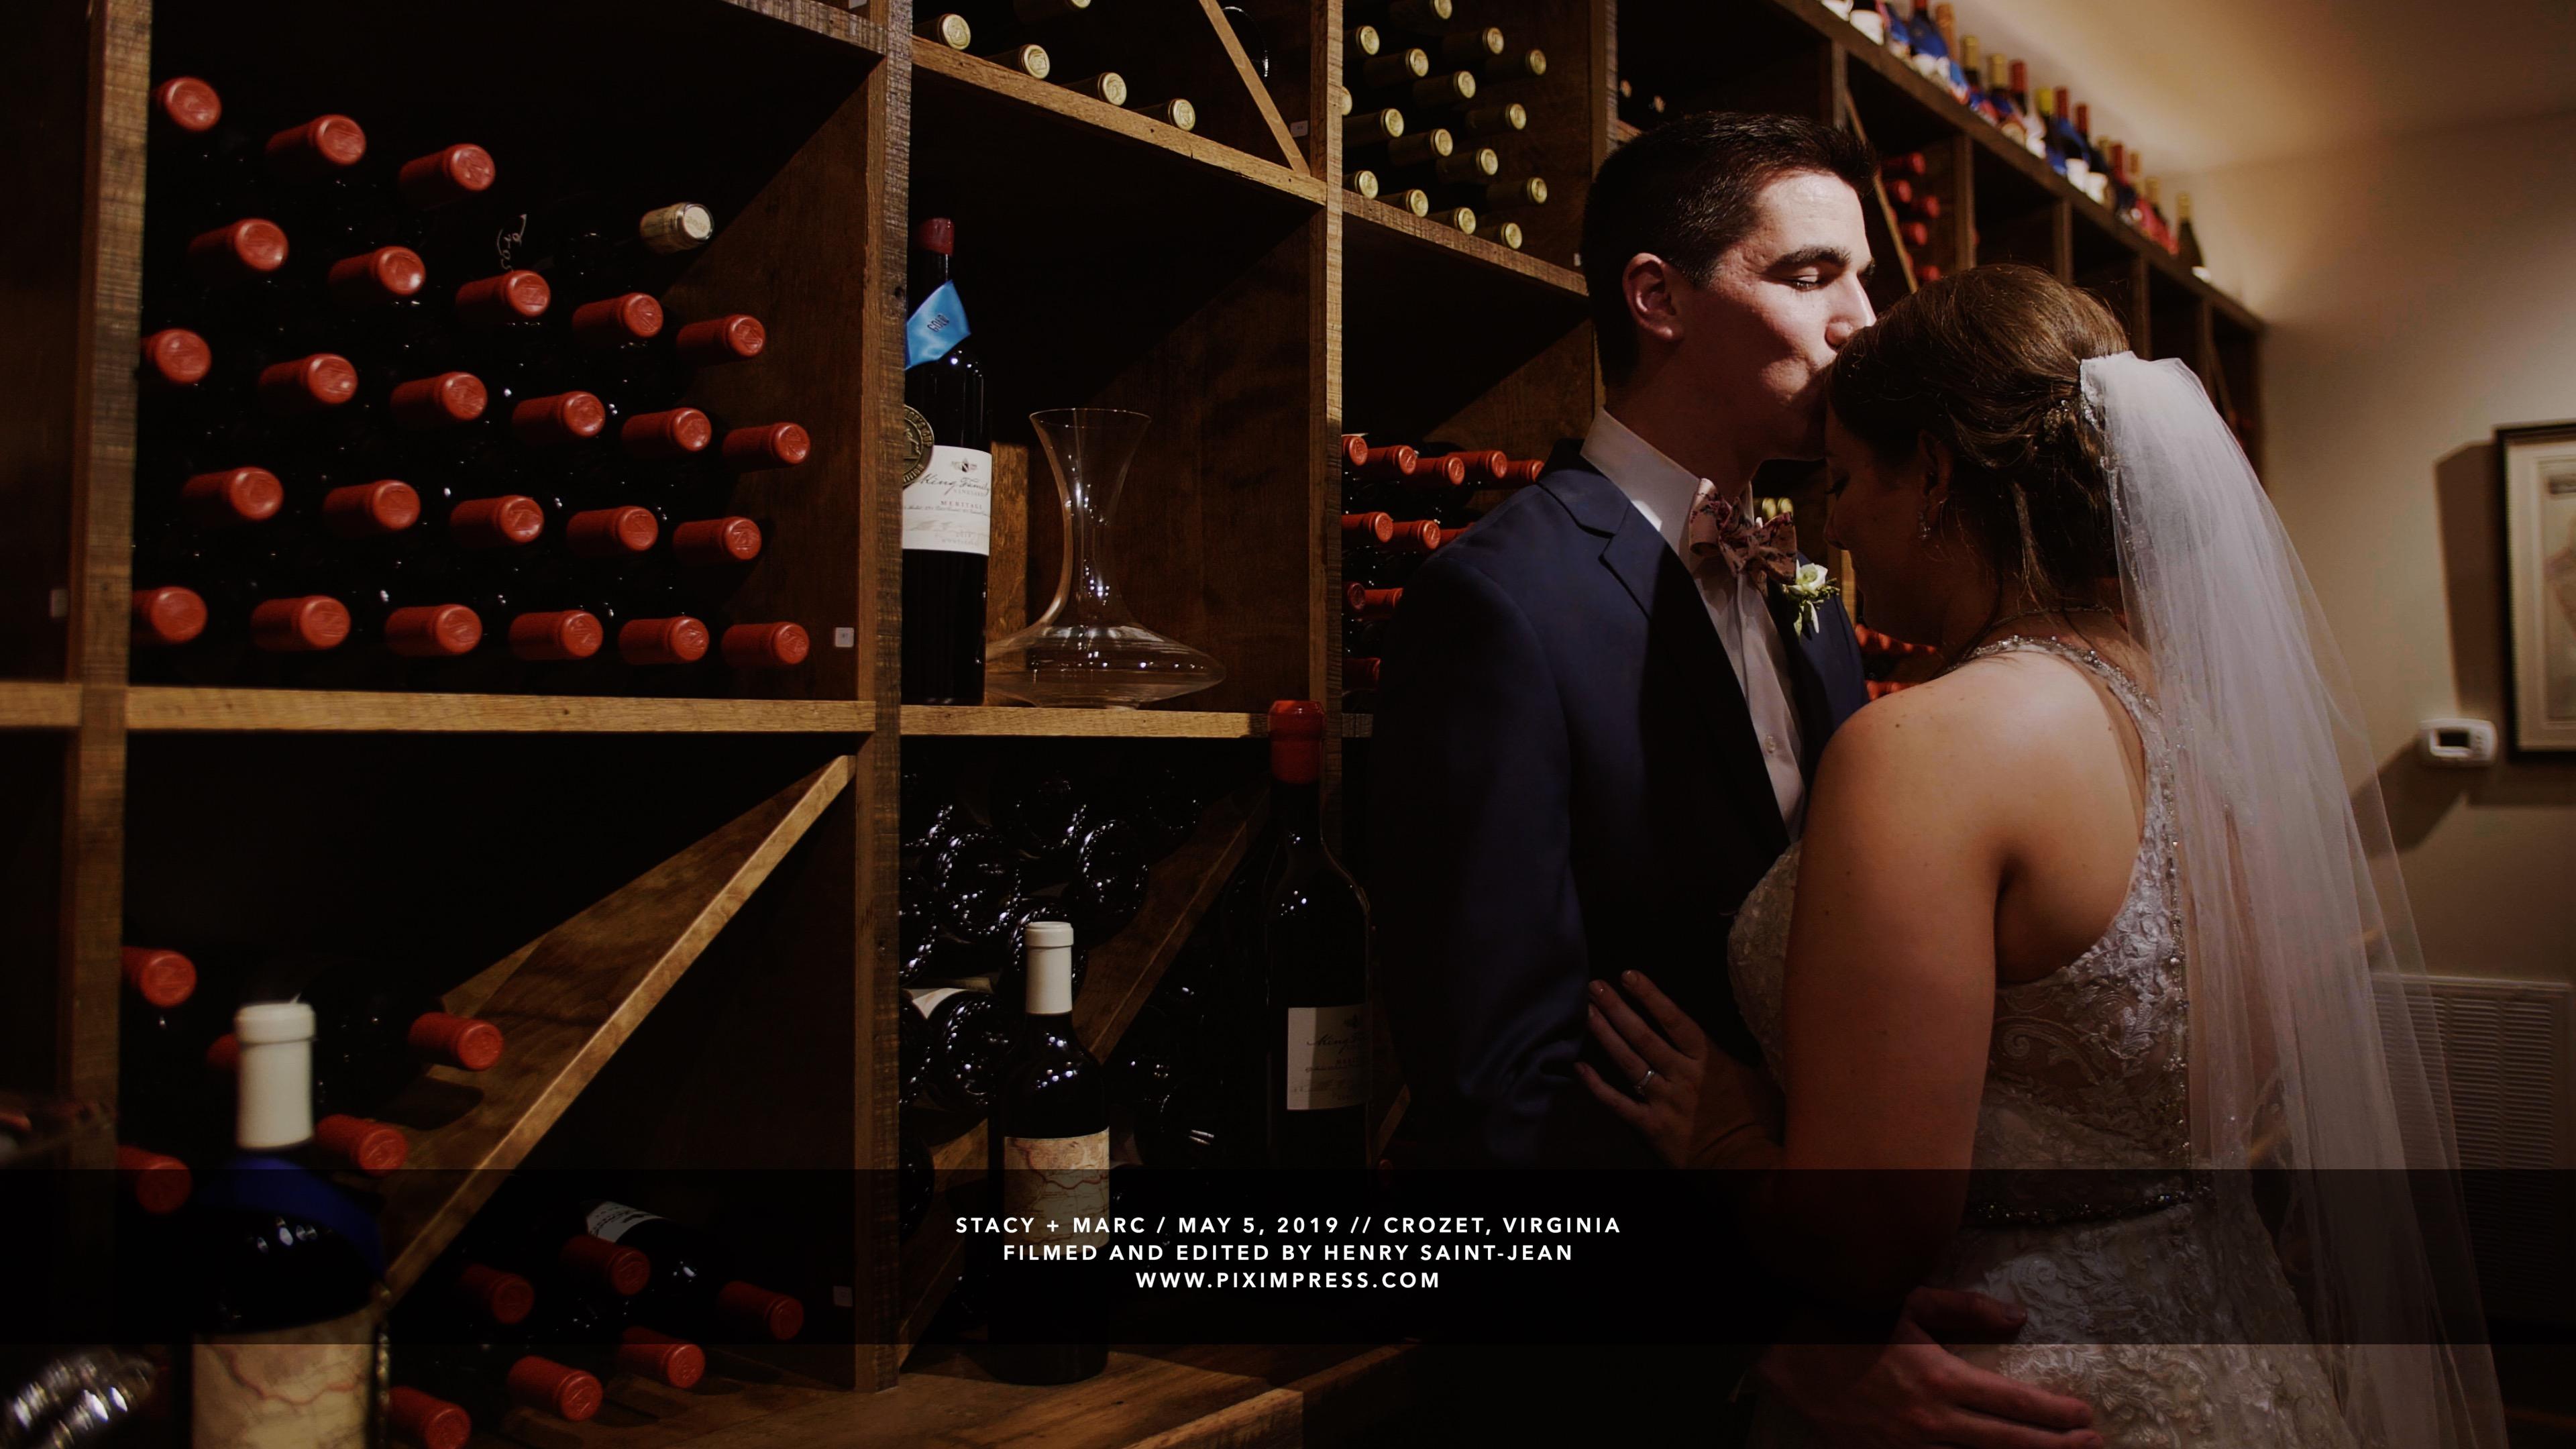 Stacy + Marc | Crozet, Virginia | King Family Vineyards